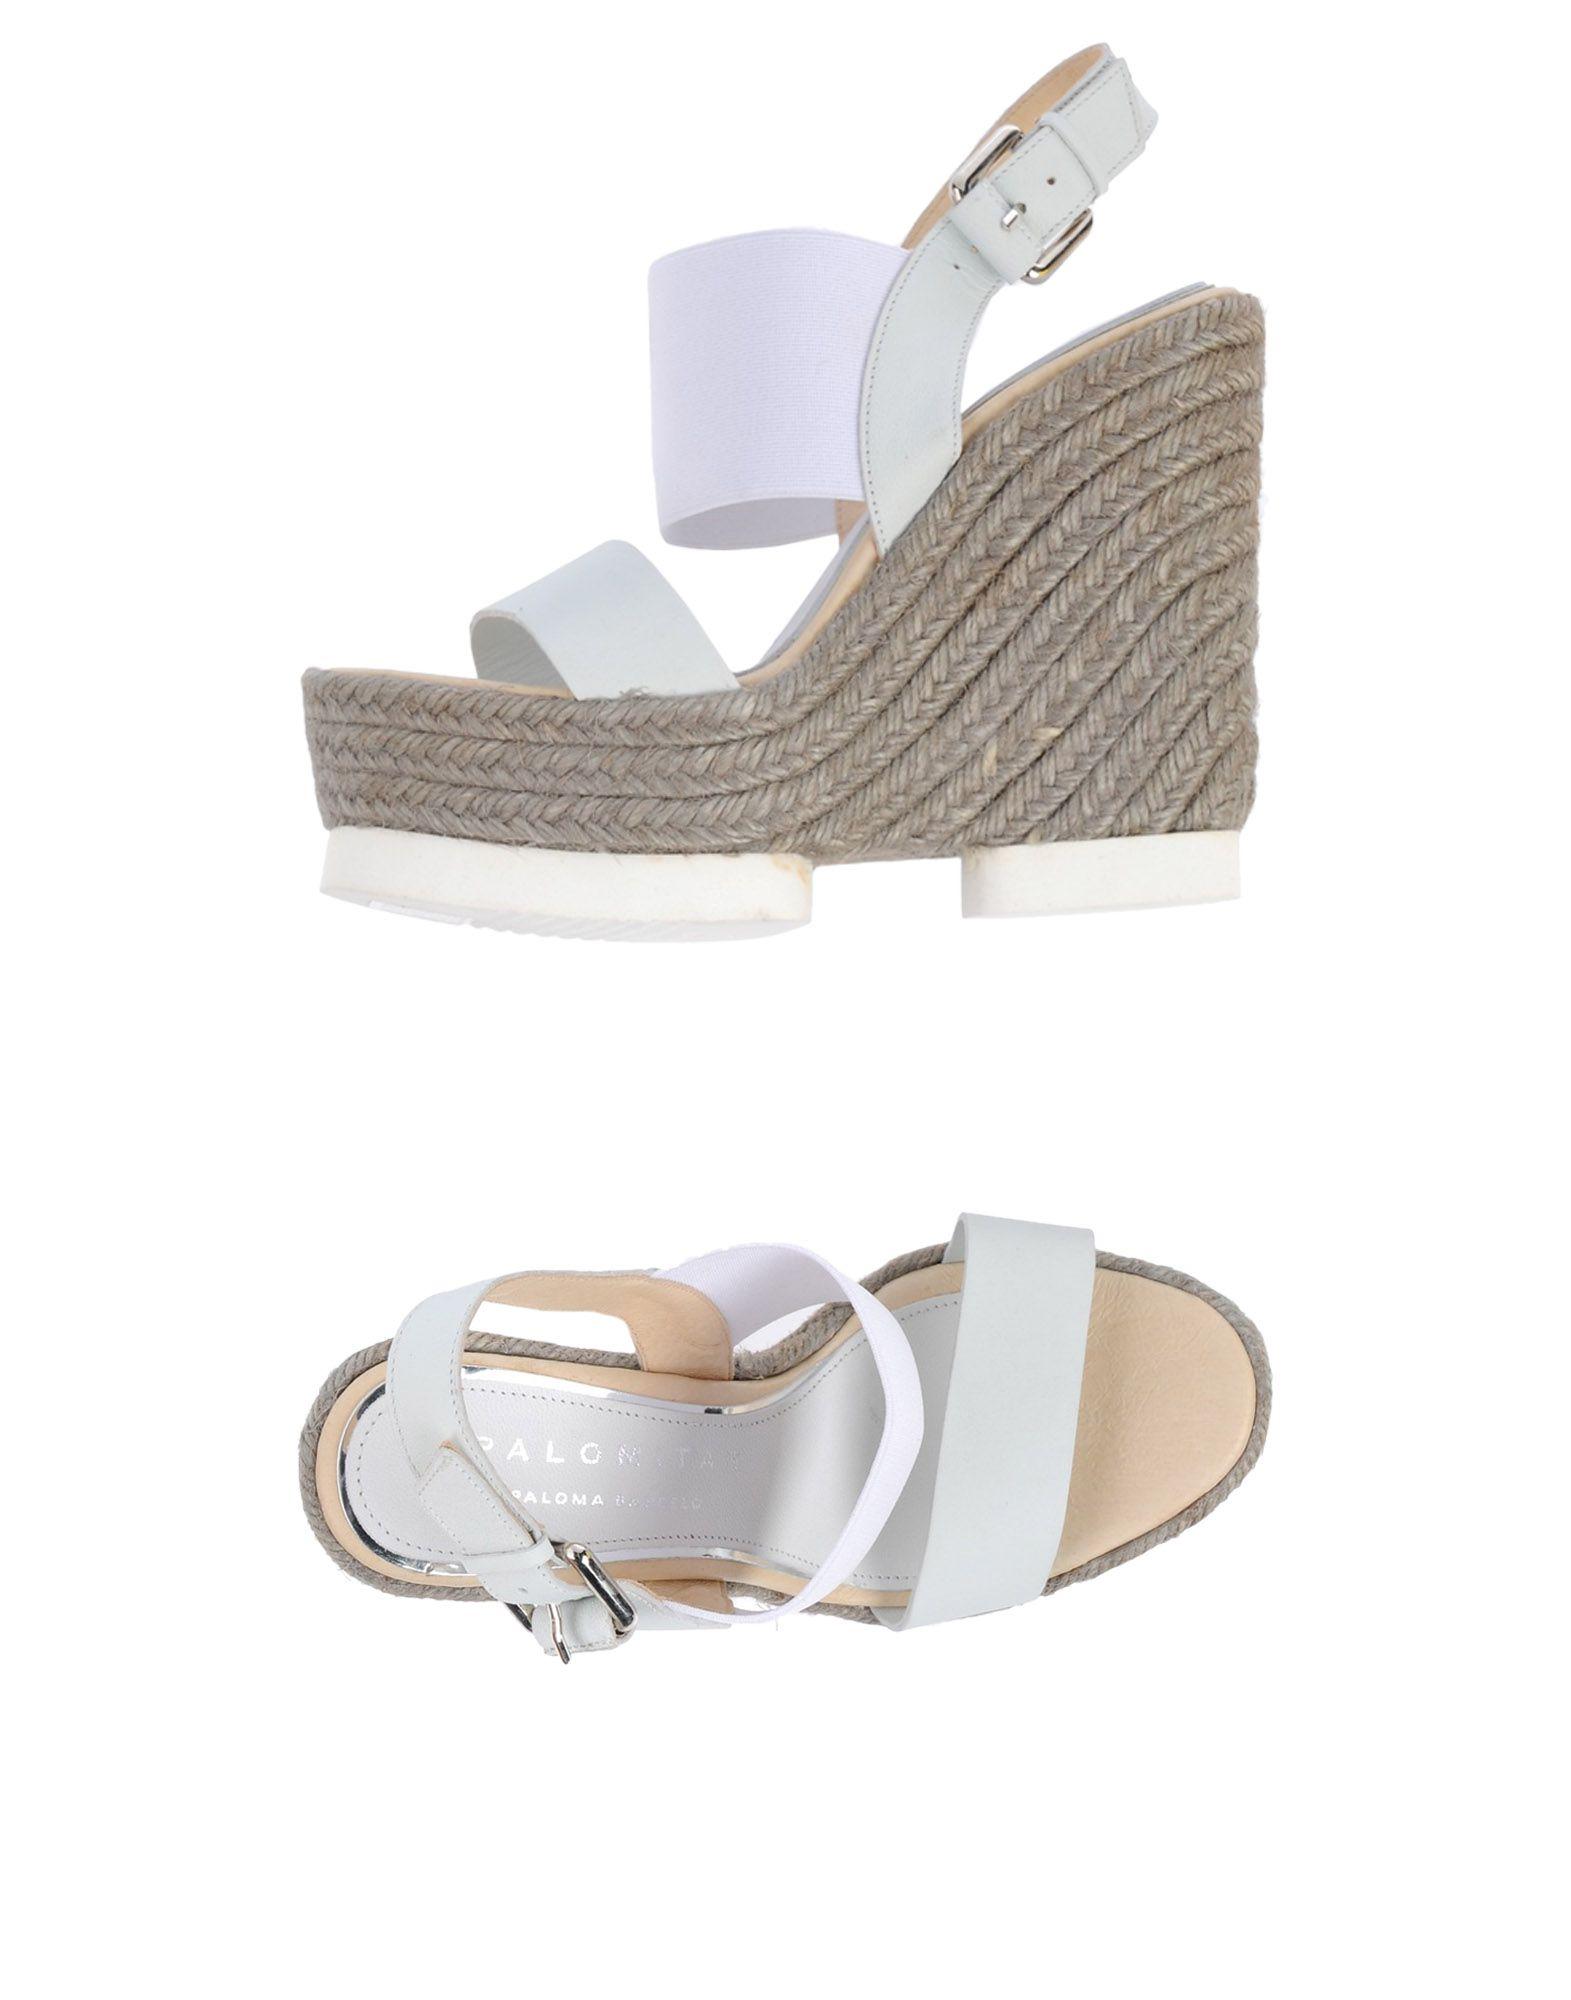 Paloma Barceló Sandalen Damen  Qualität 11477671IJ Gute Qualität  beliebte Schuhe 224822